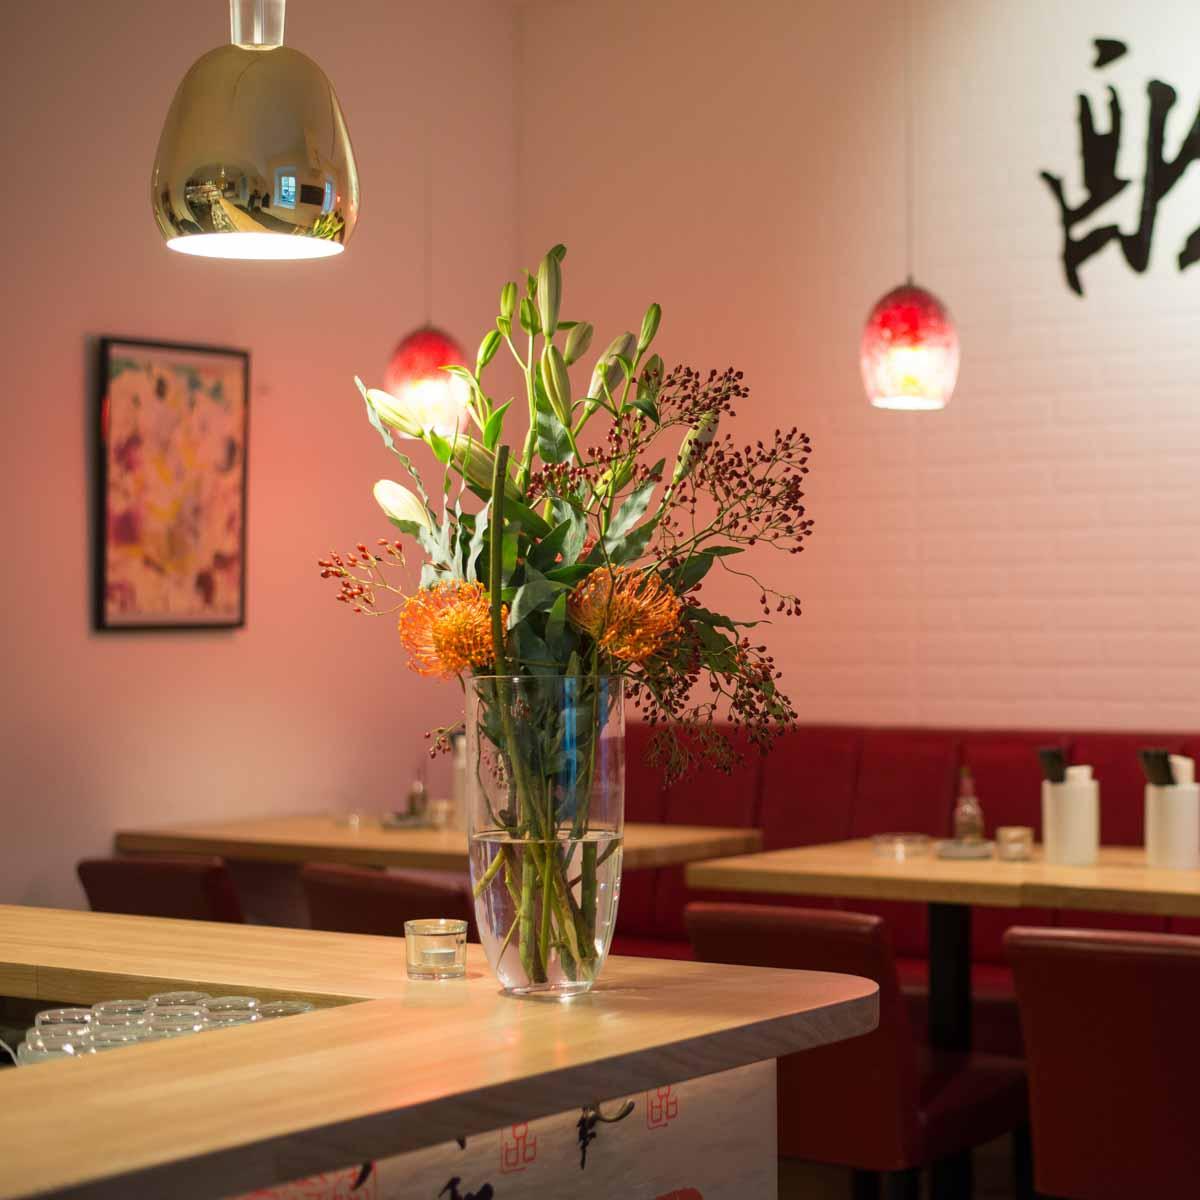 Restaurant Chili & Pfeffer in Wien-2